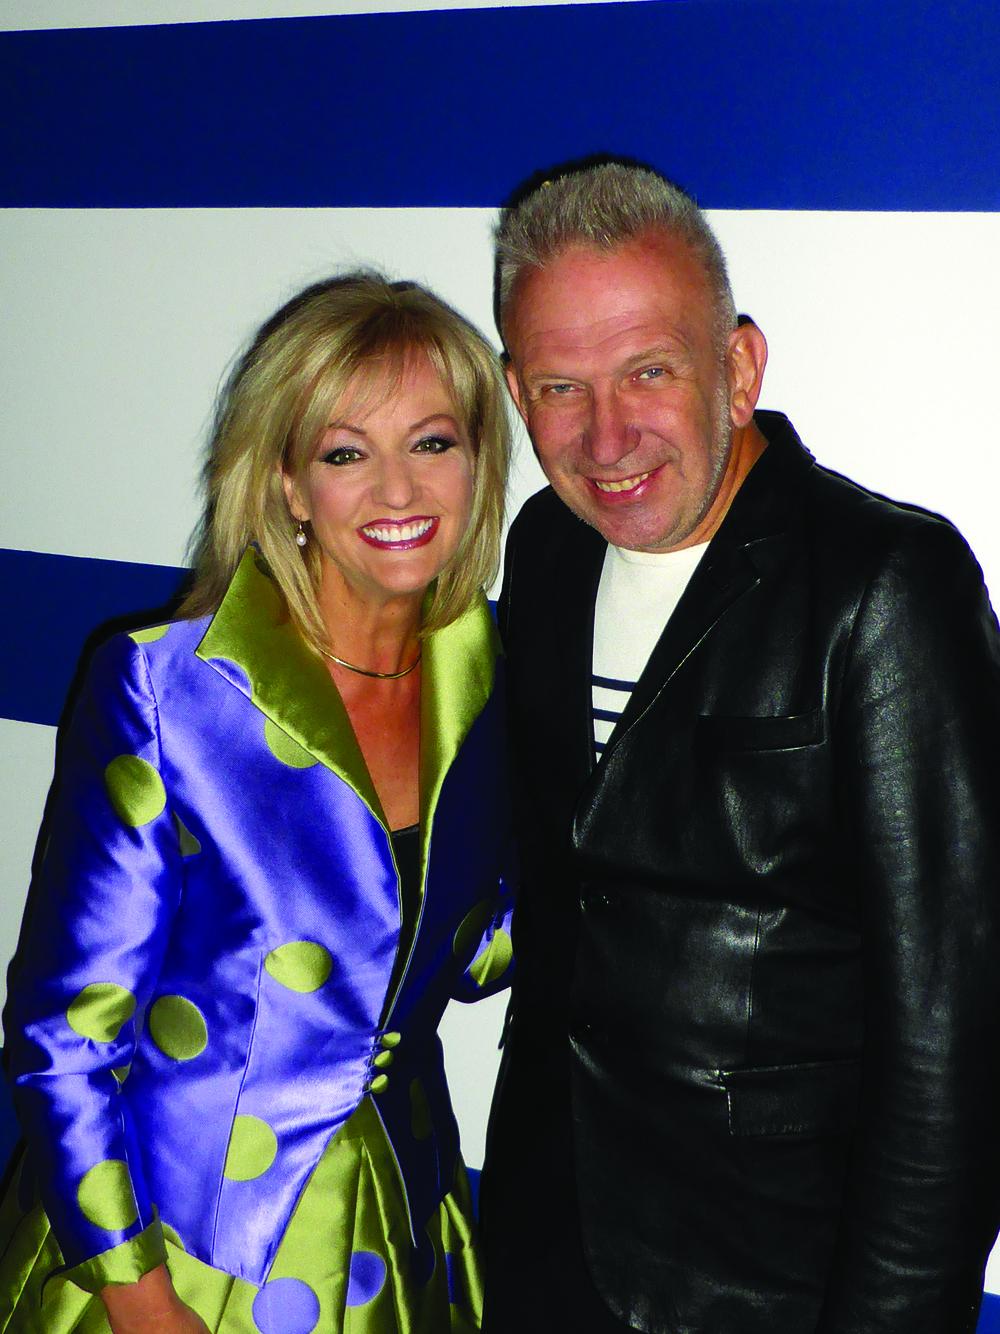 Heidi and Jean Paul Gaultier